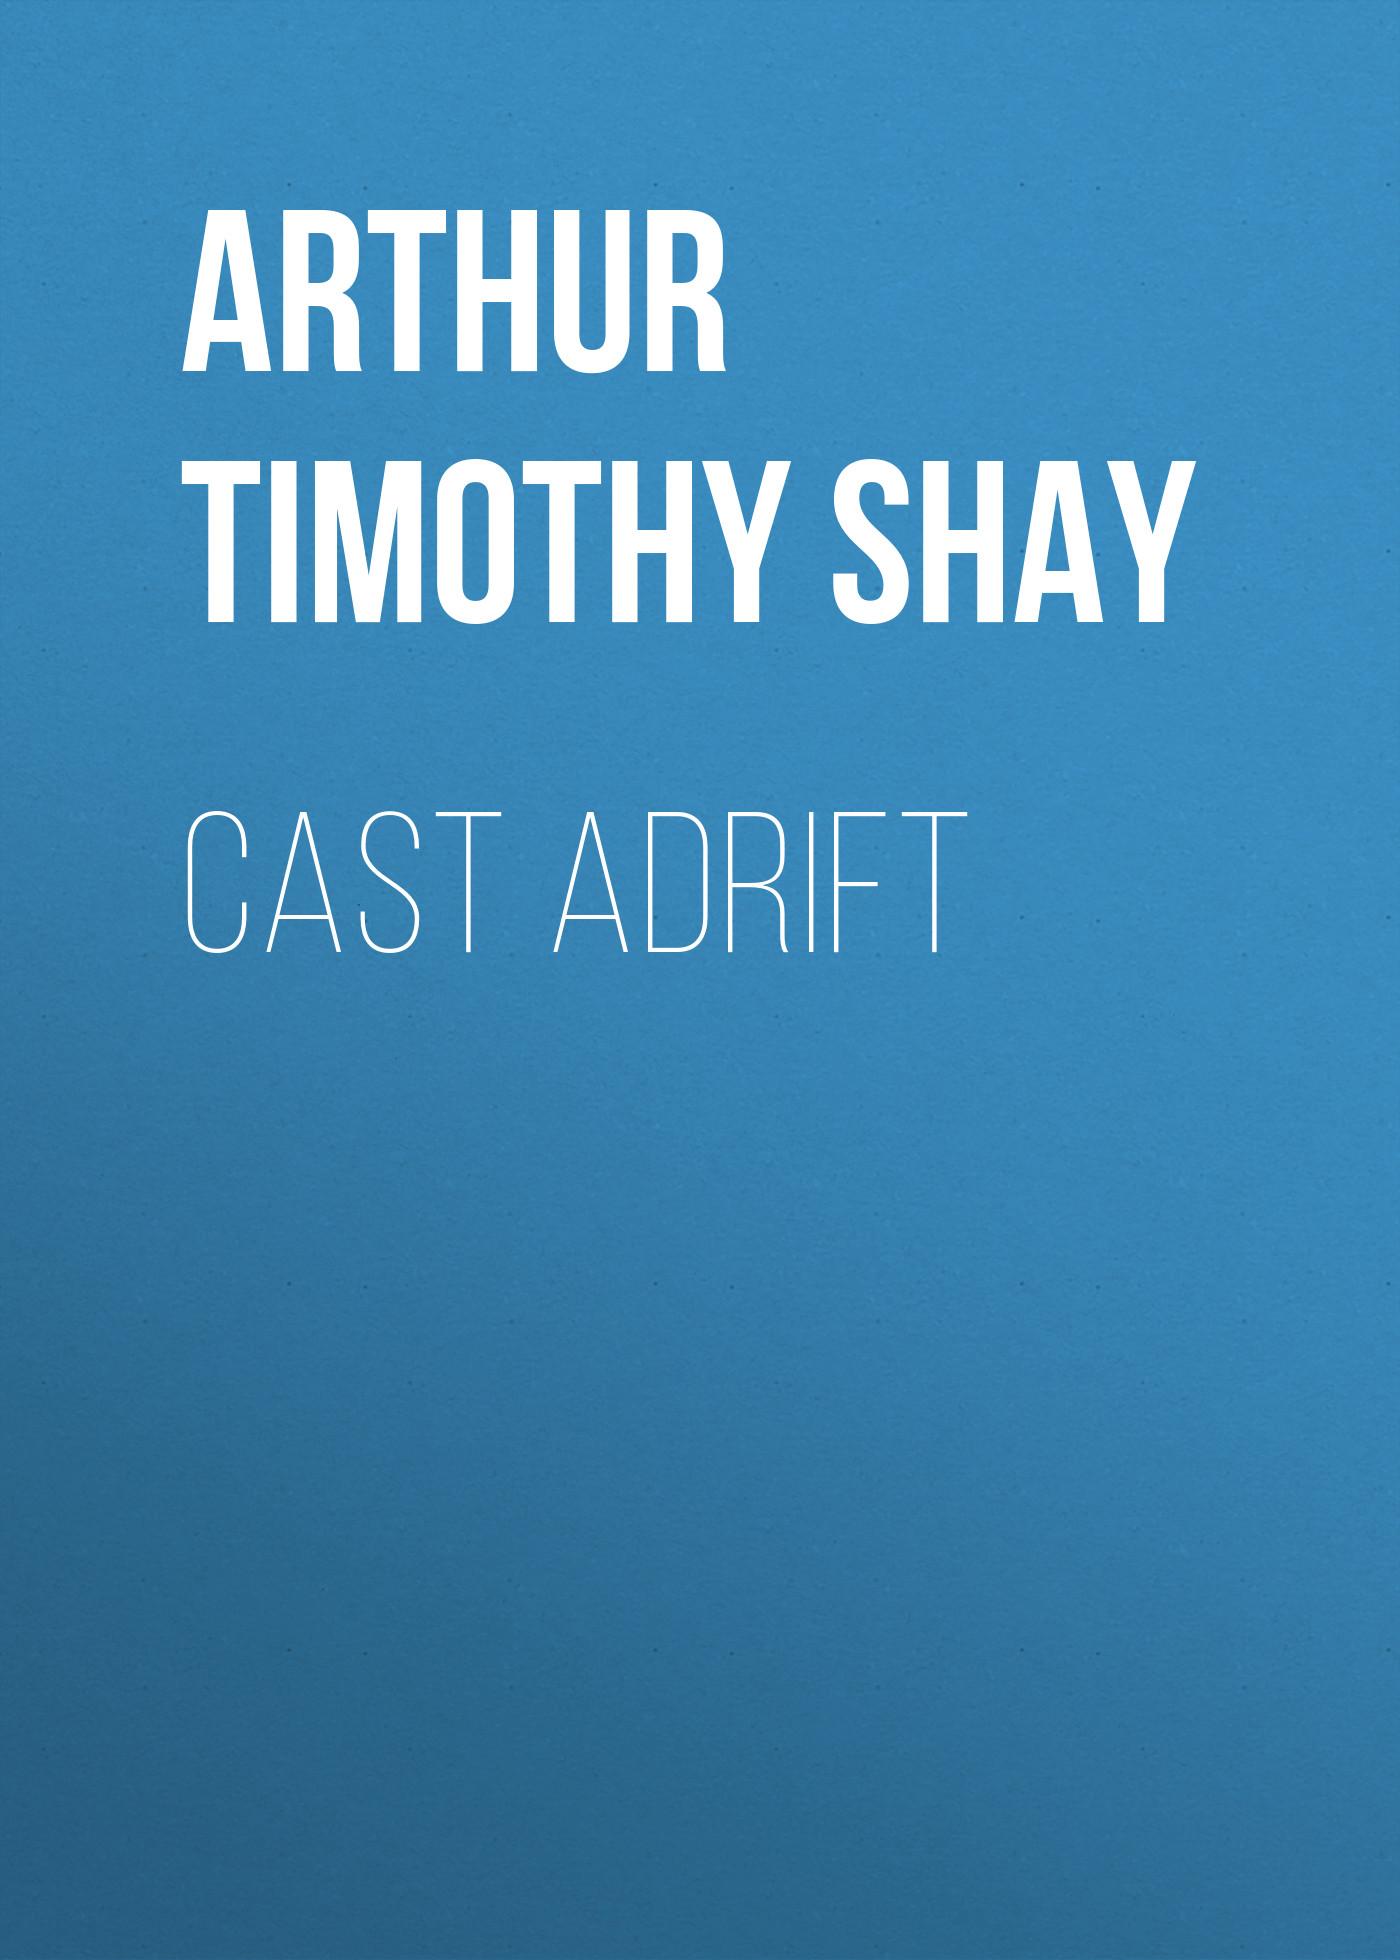 Arthur Timothy Shay Cast Adrift cut adrift page 5